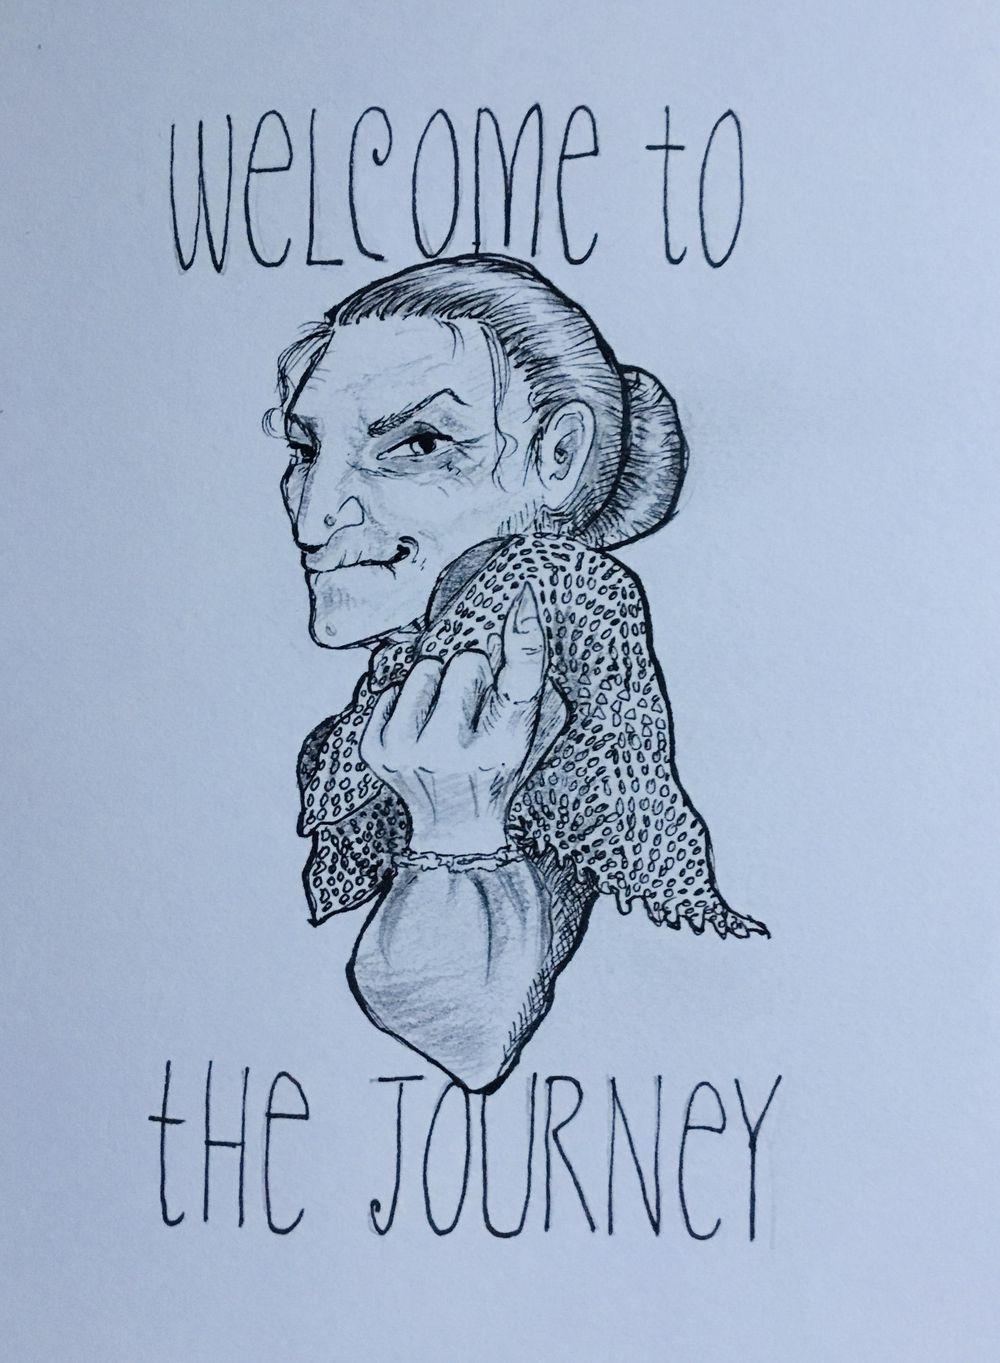 strange journey - mission accomplished! - image 14 - student project